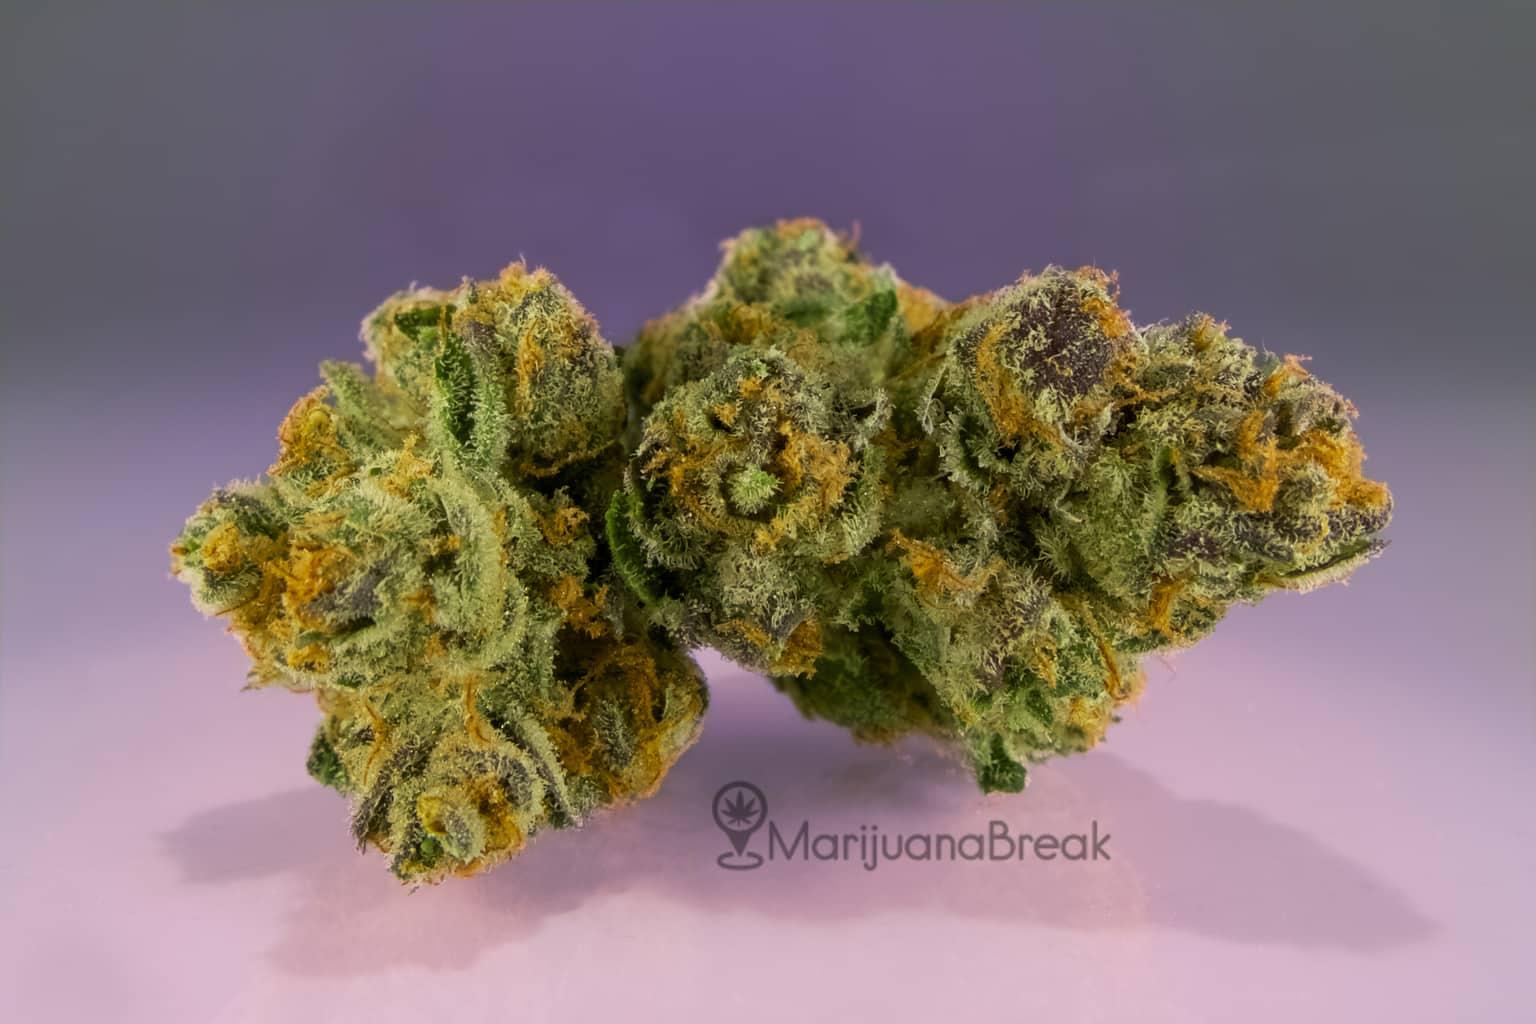 granddaddy purple (indica marijuana strain)